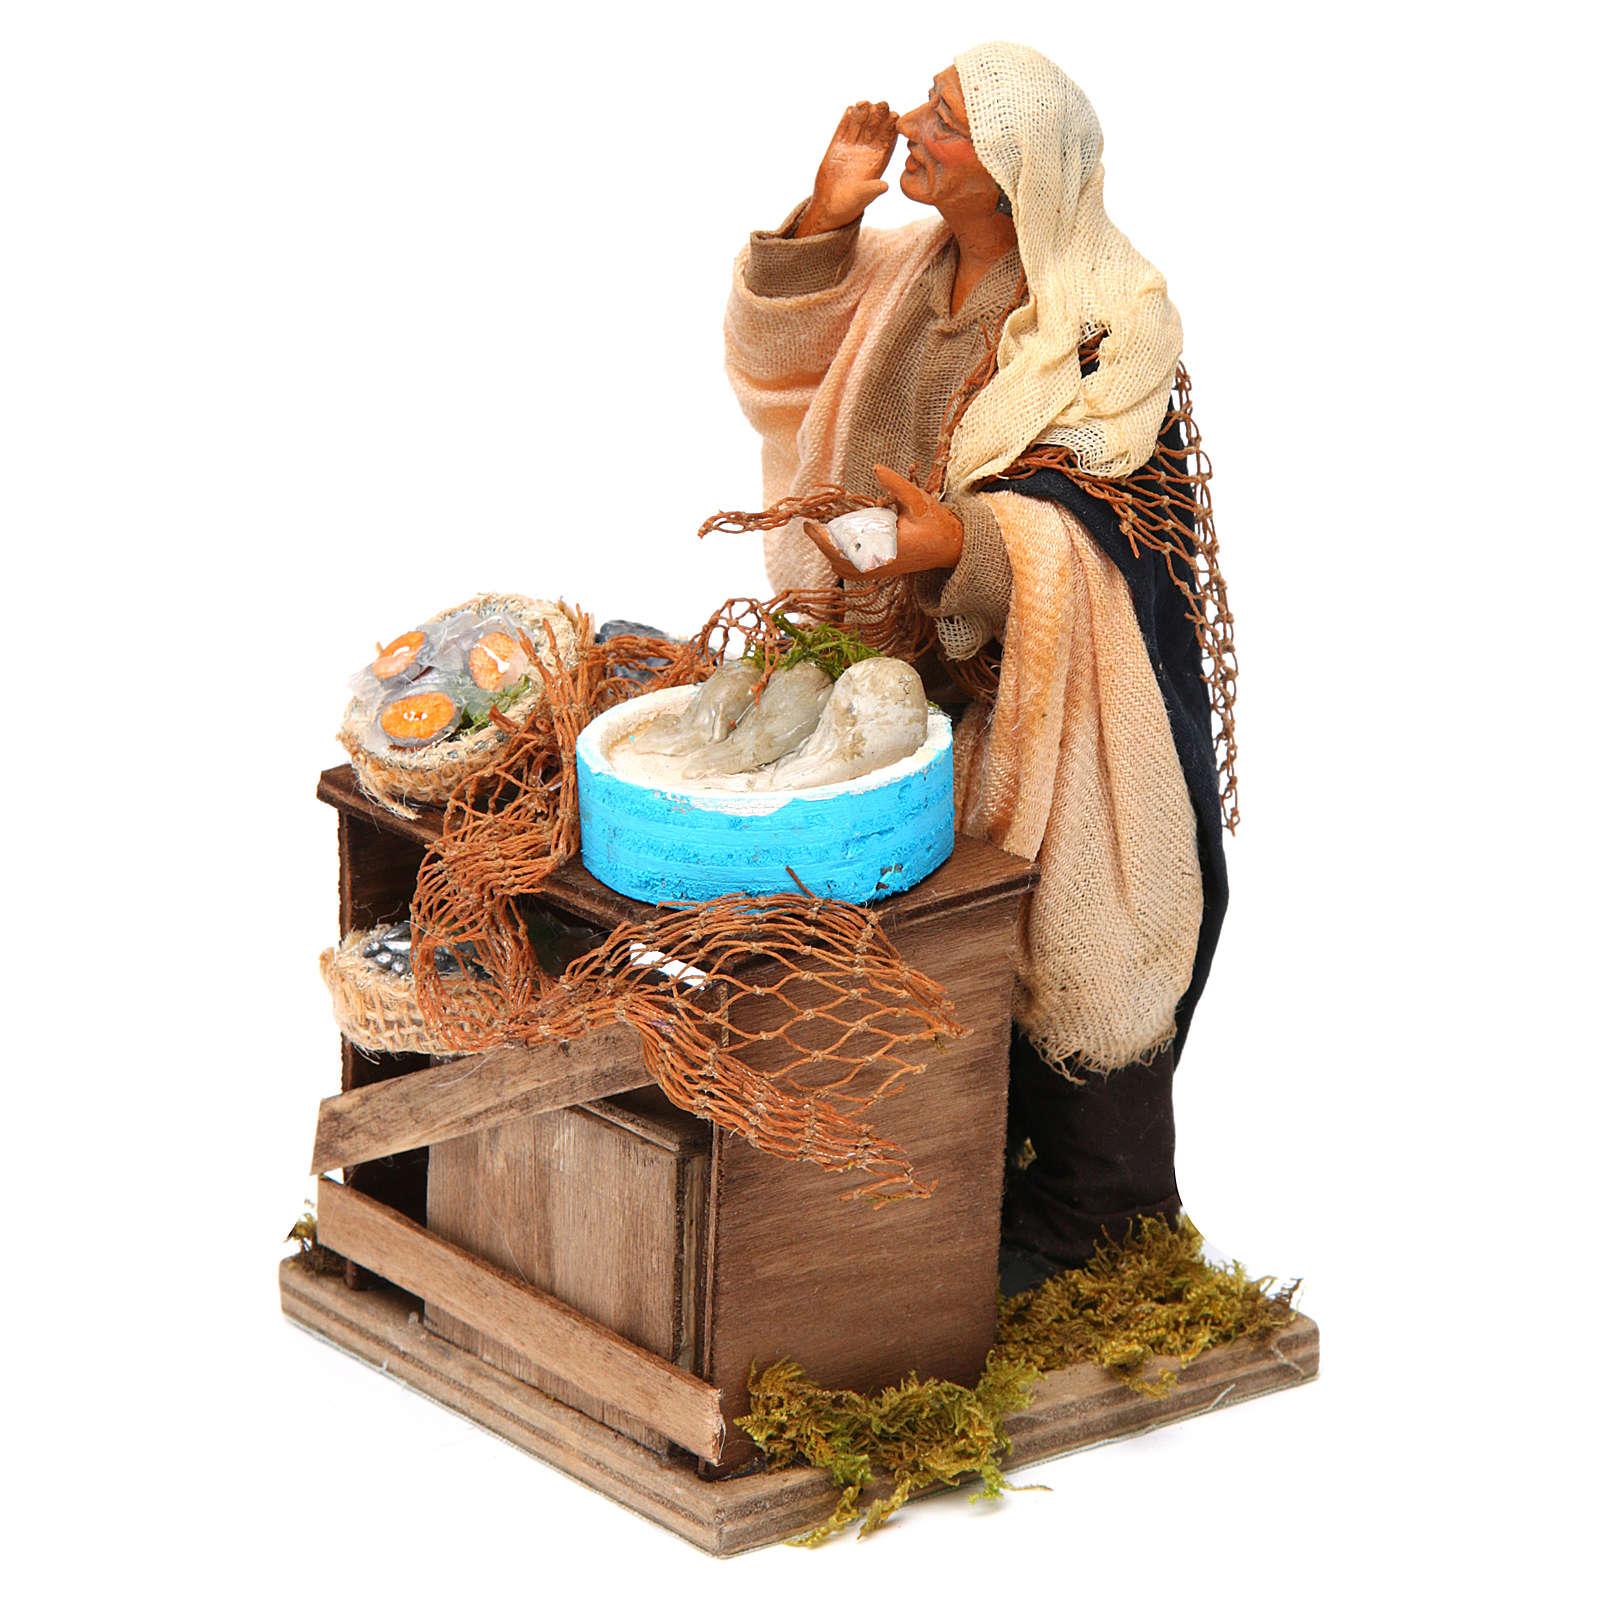 Animated nativity scene, fishmonger 14 cm 4